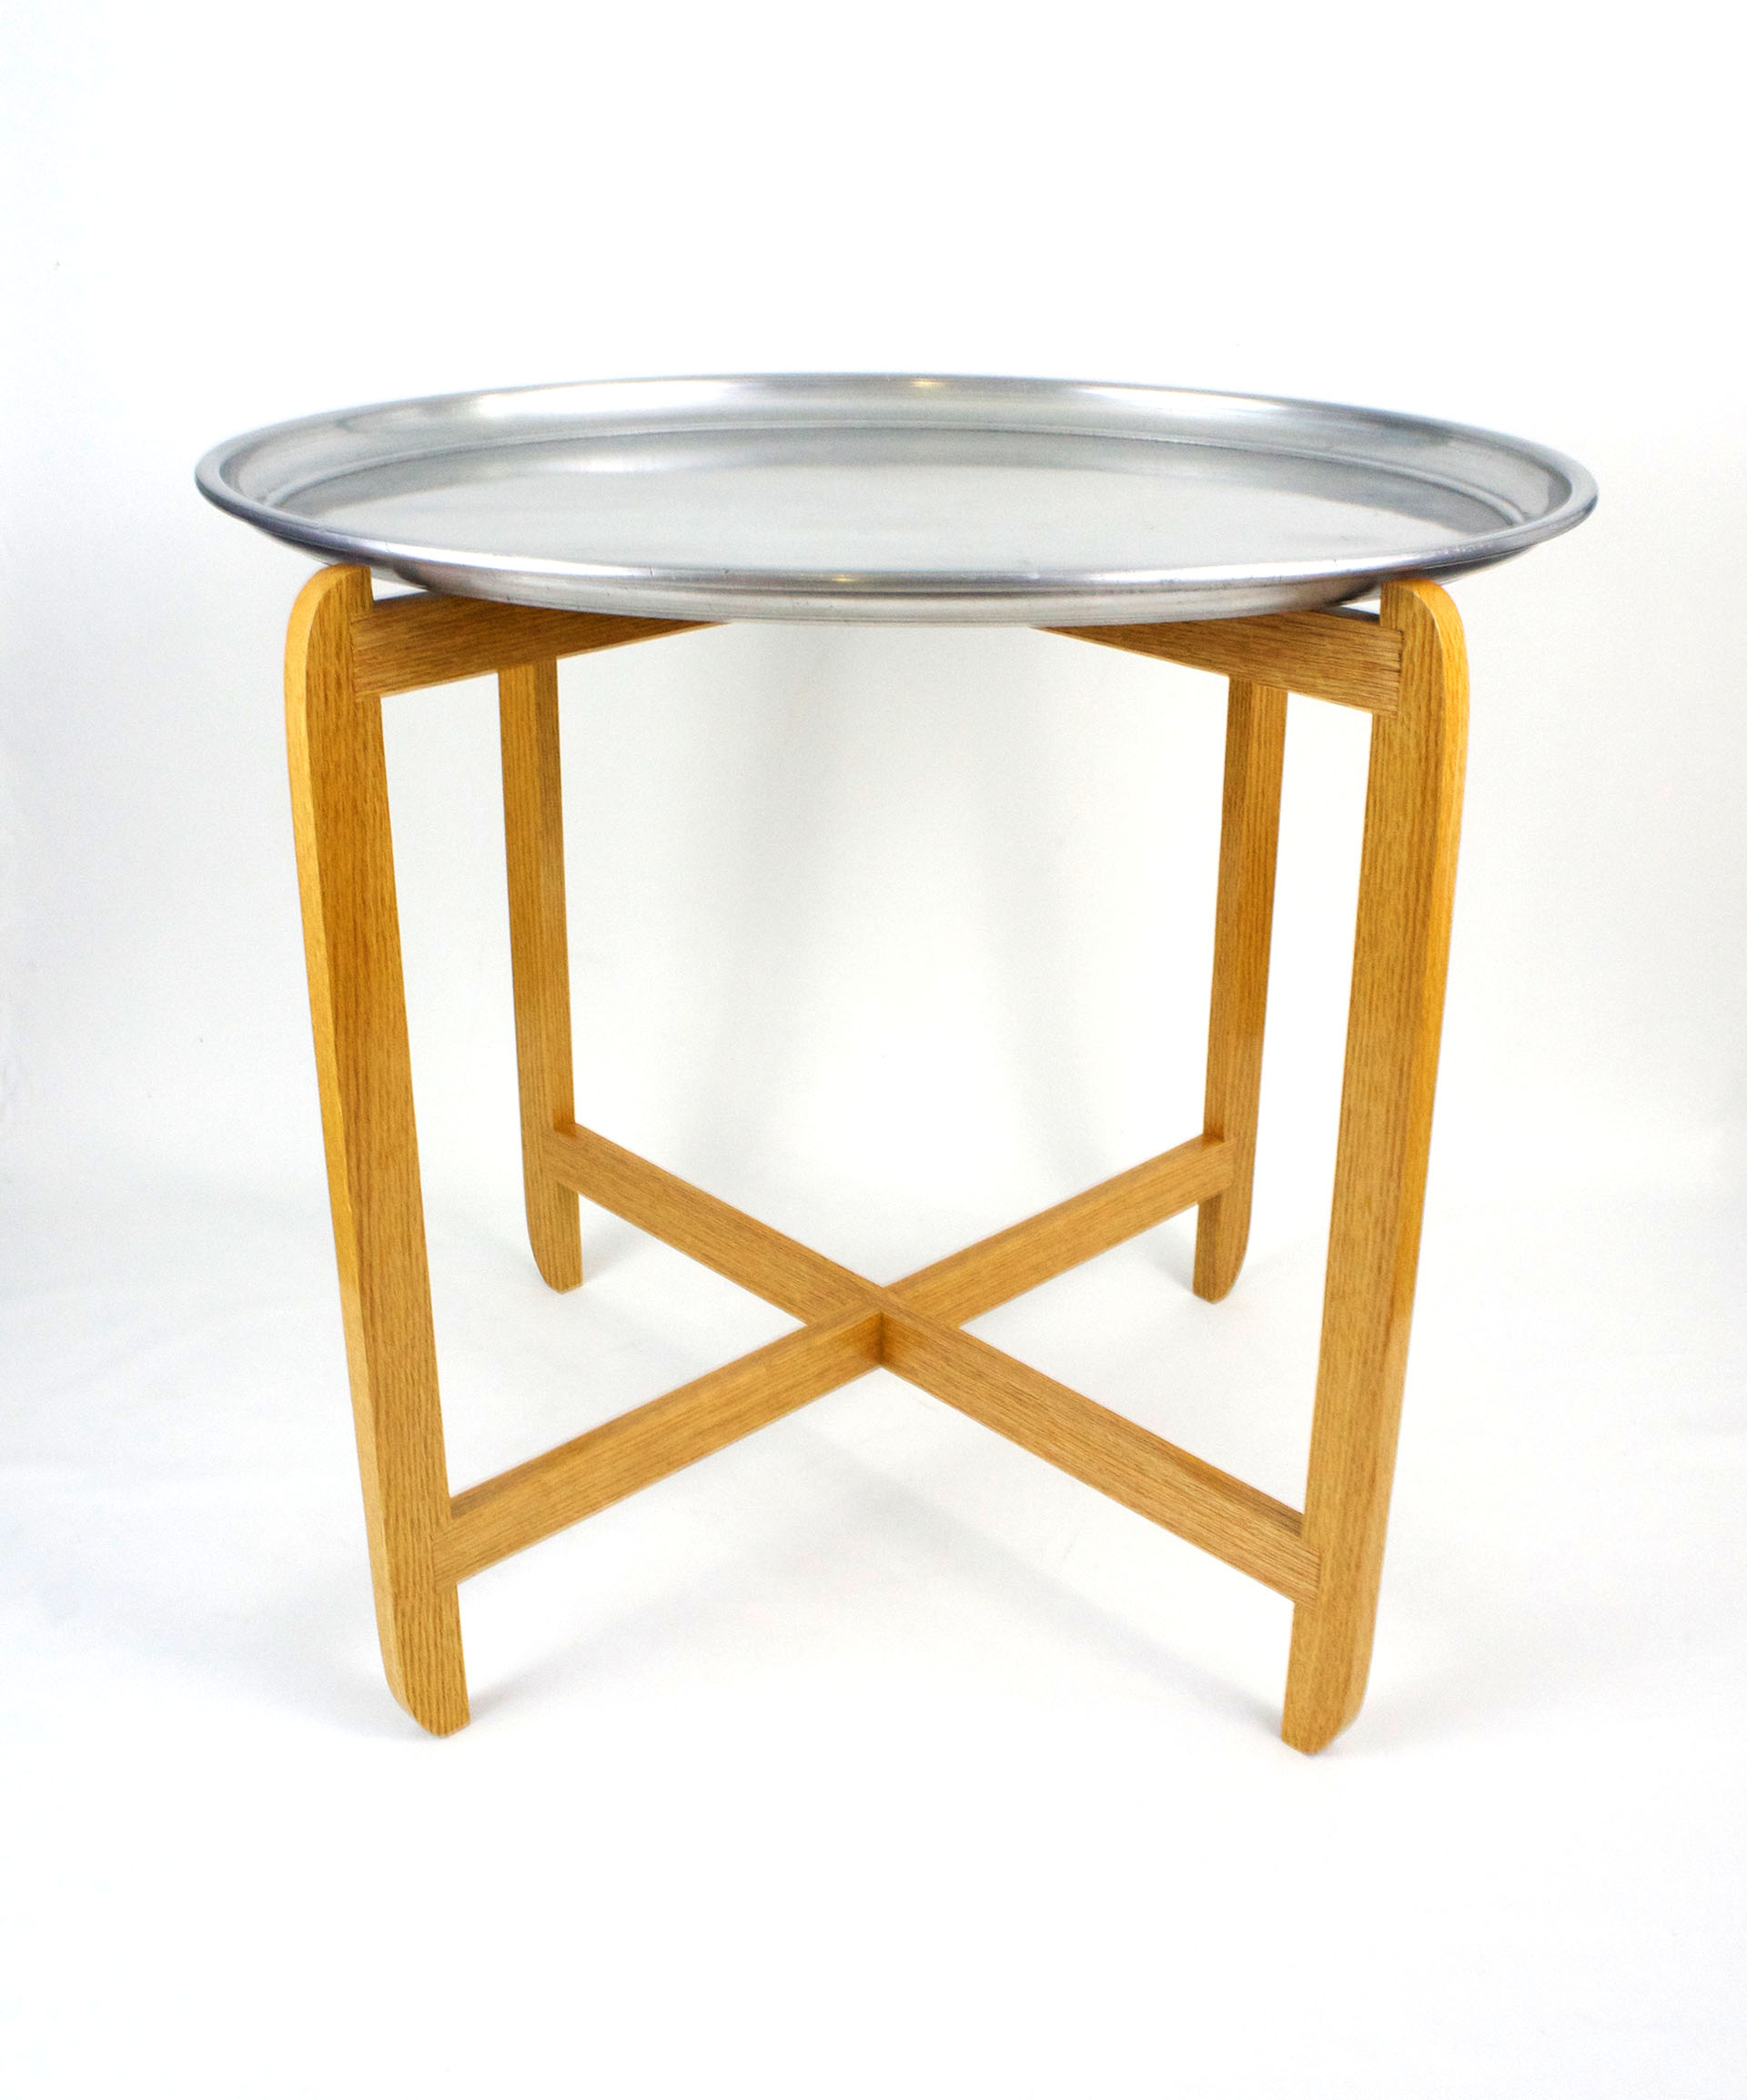 Alum tray table 1.jpg